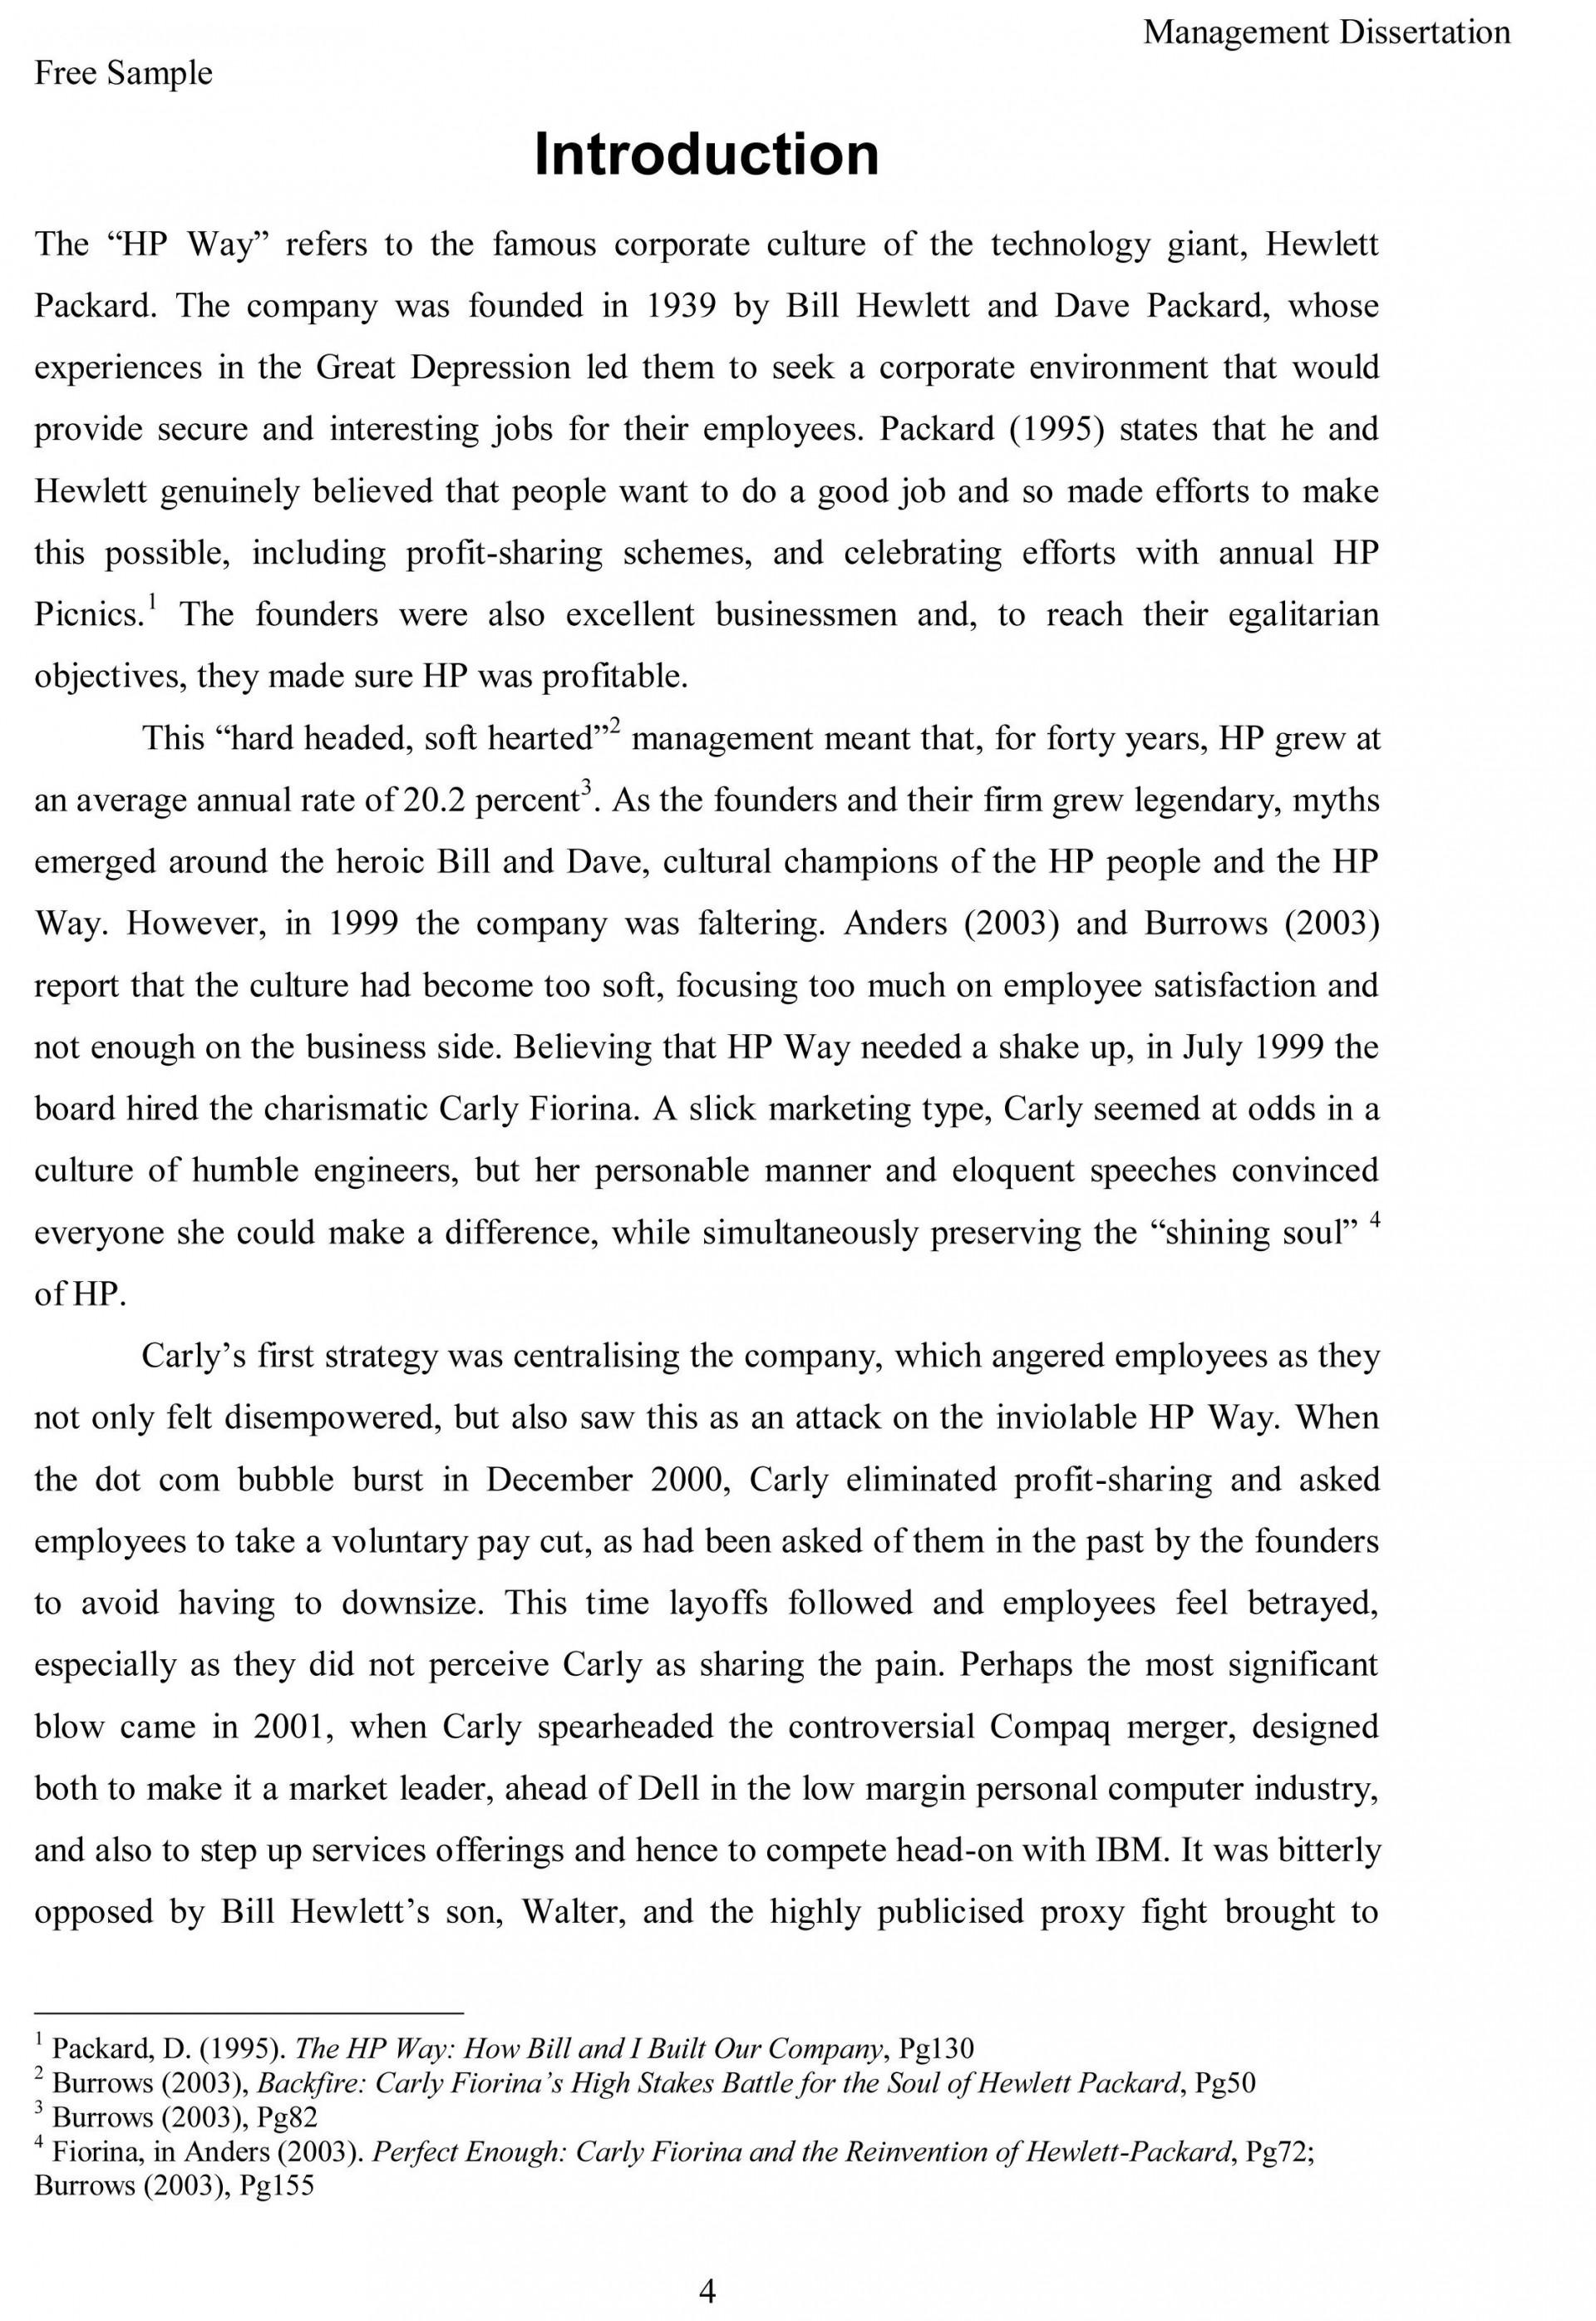 008 Unusual Essay Paper High Resolution  Upsc 2019 In Hindi Pdf Format Cs Past 20181920